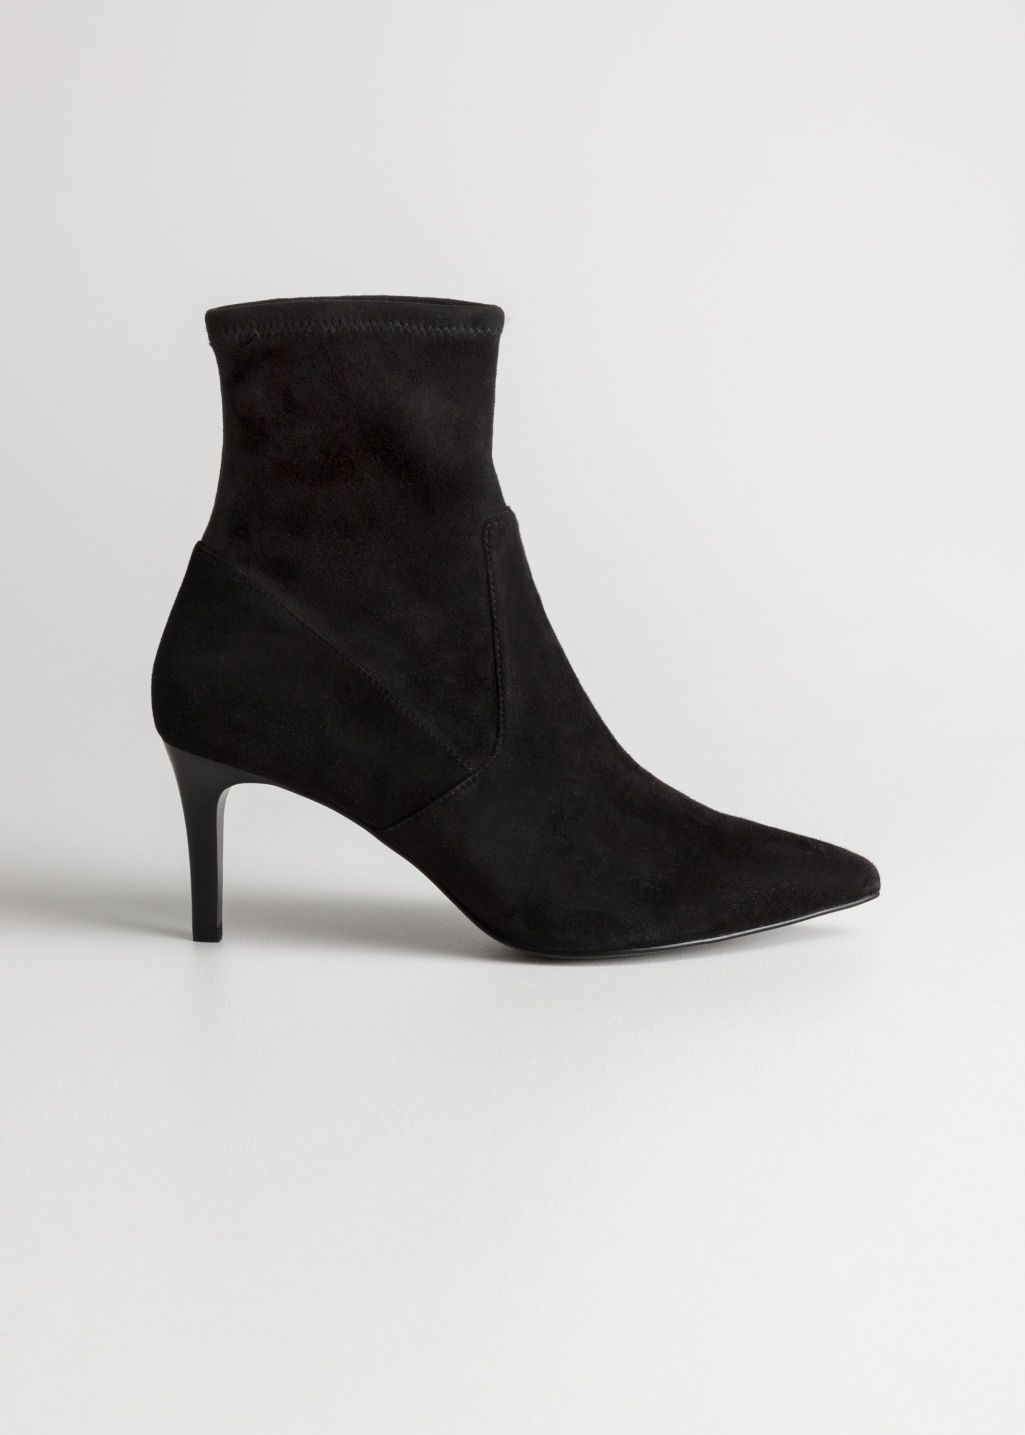 Suede Sock Boots Kitten Heel Boots Kitten Heel Ankle Boots Boots